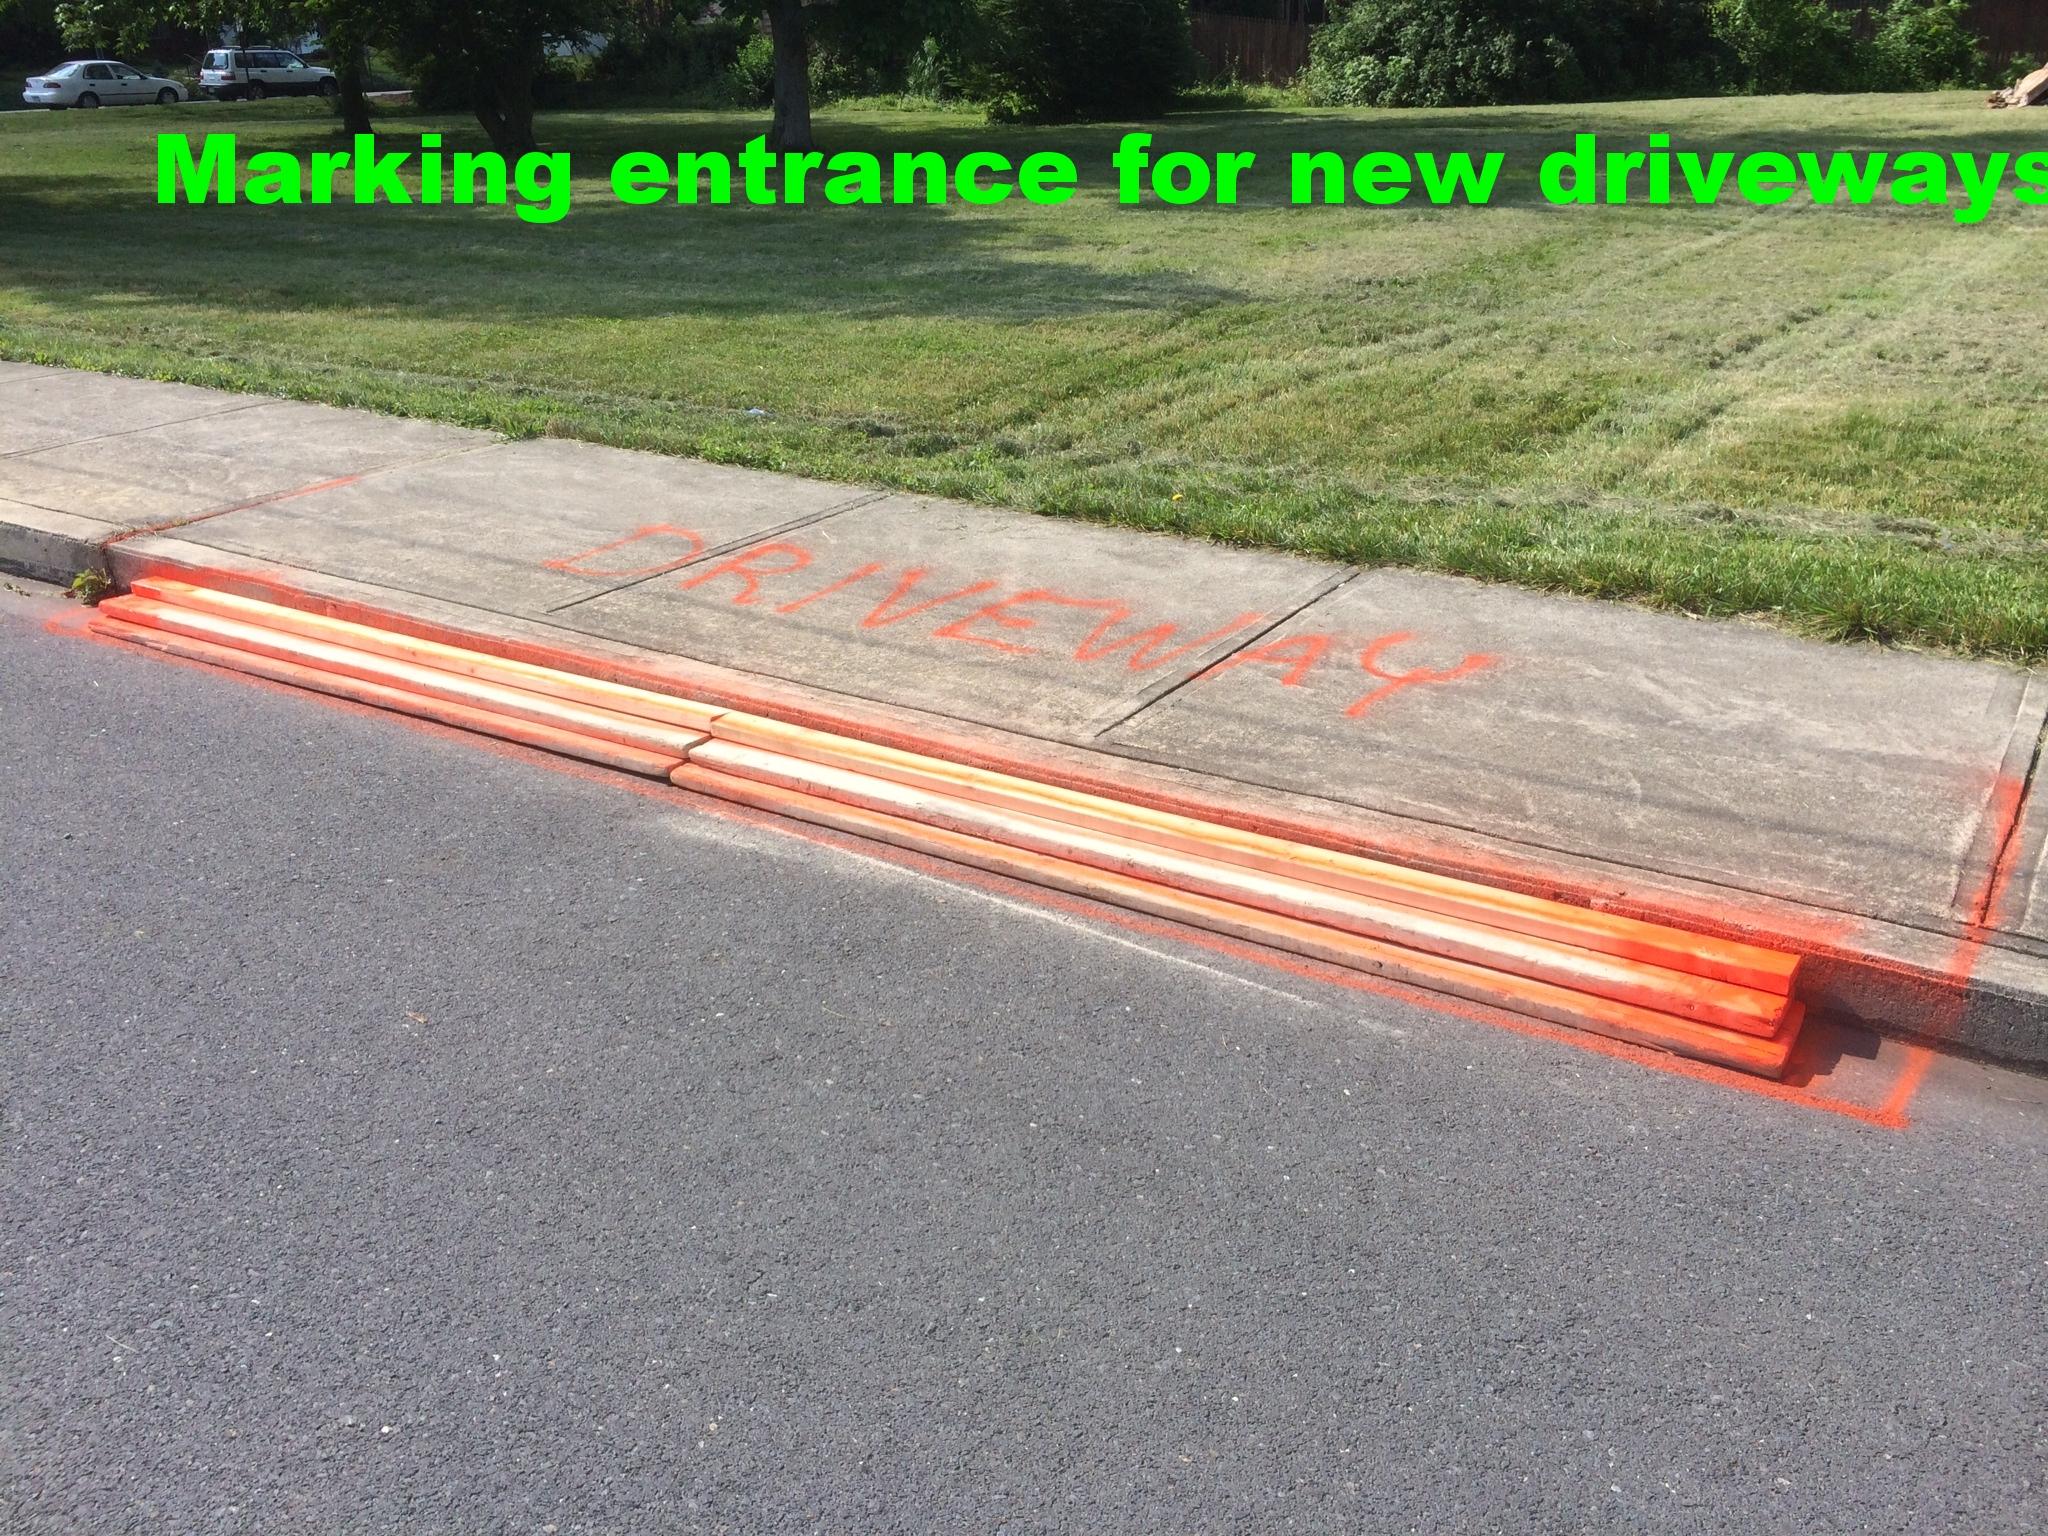 Entrance for new driveways.JPG